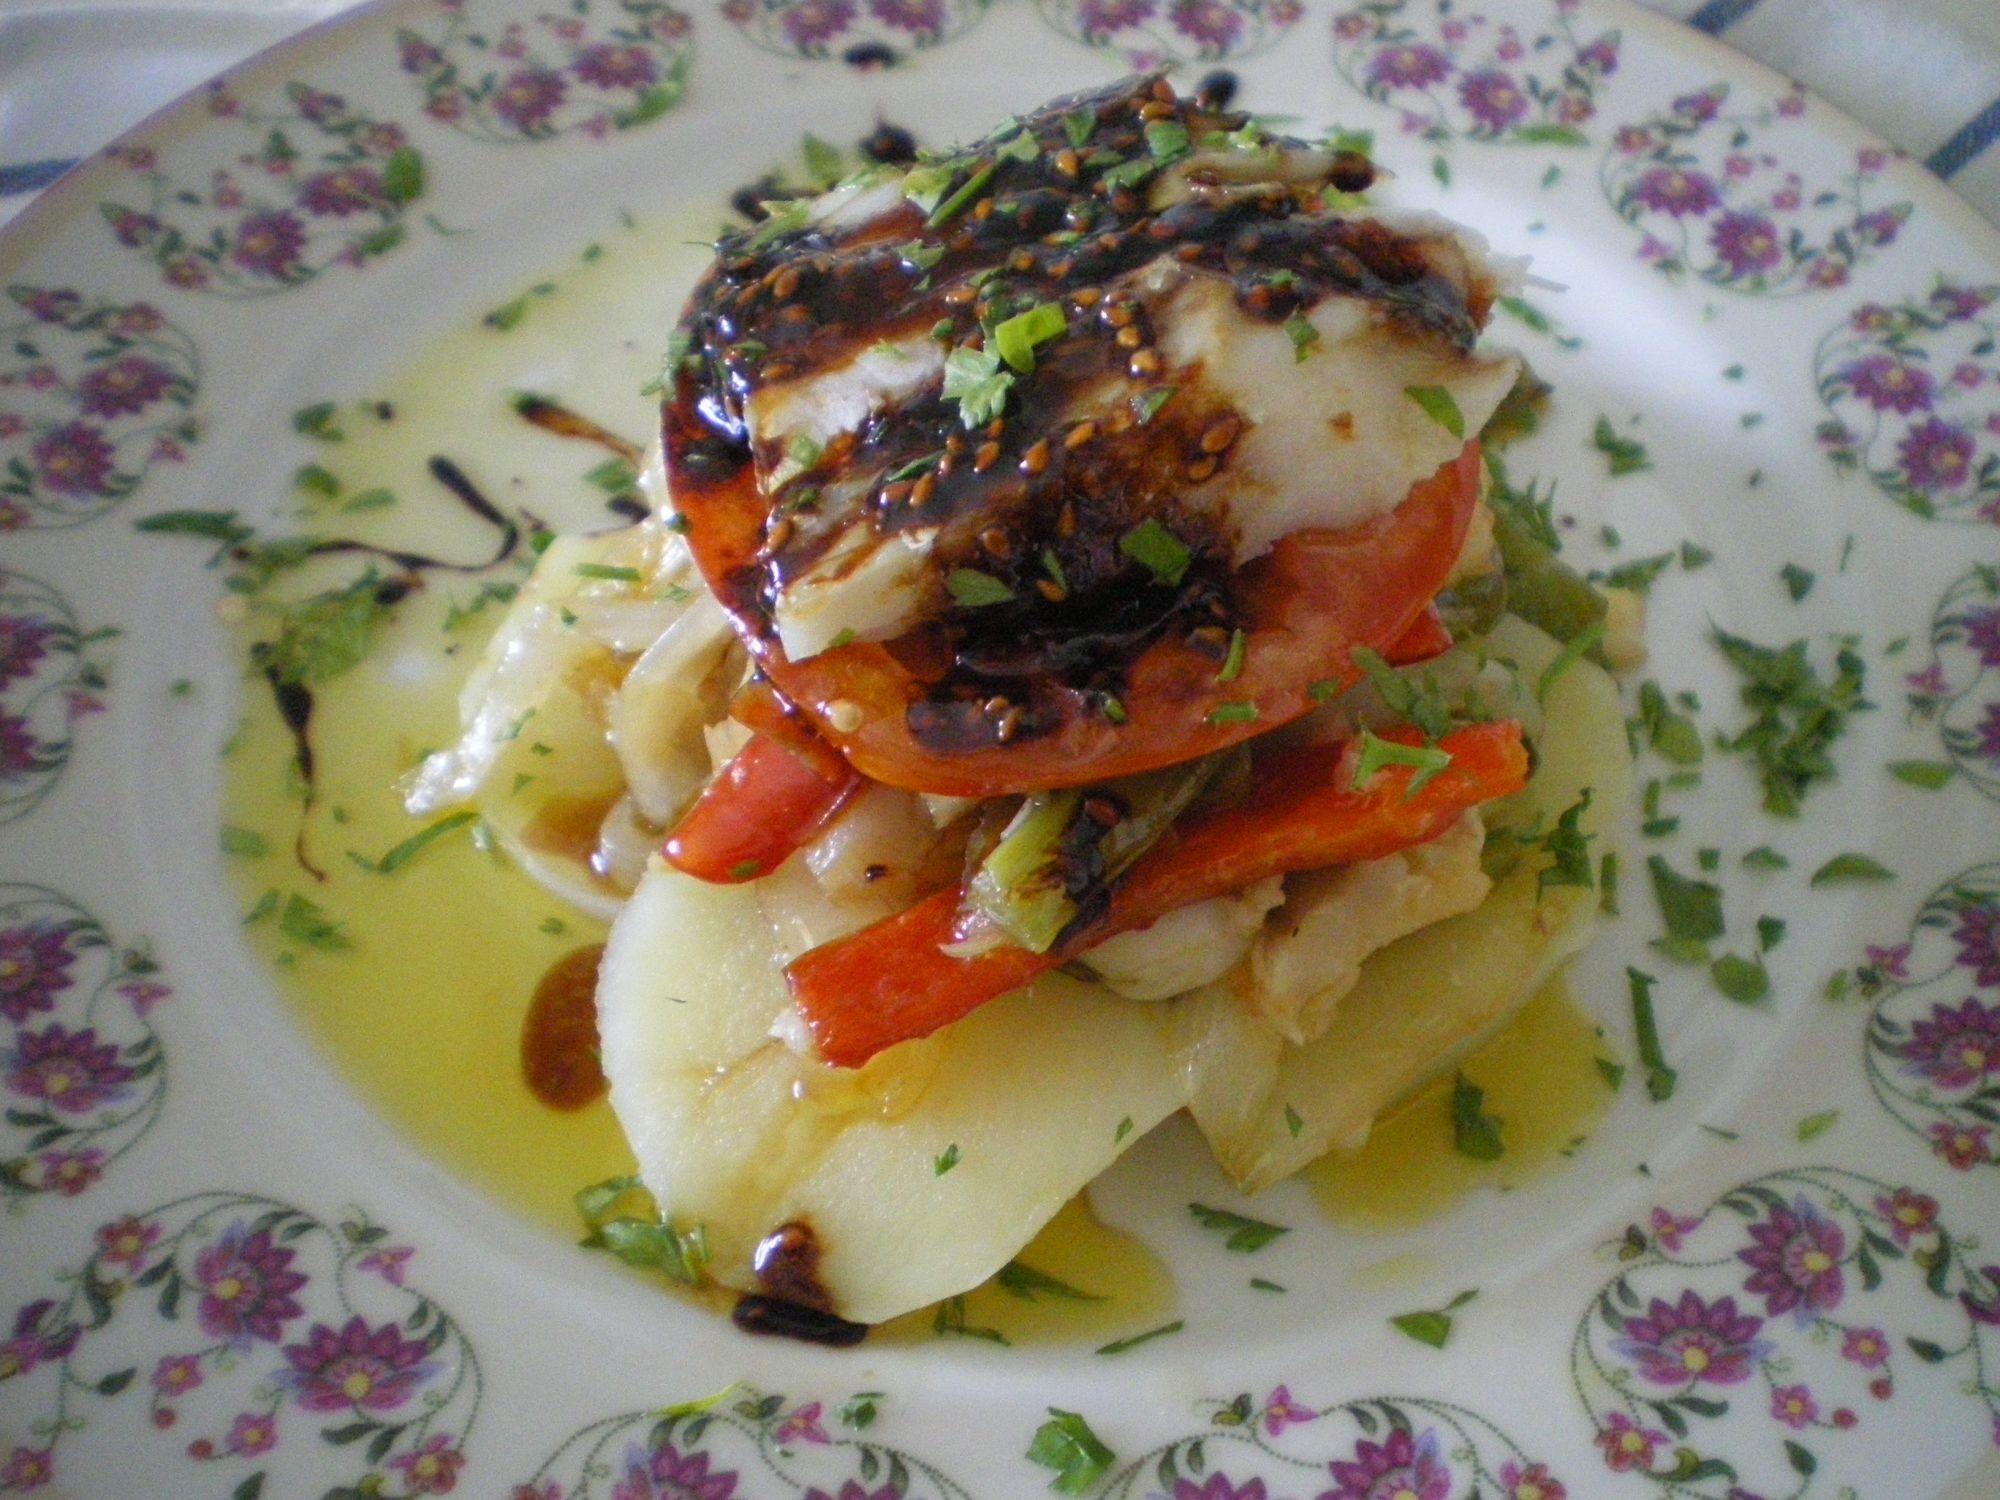 Recetas de ensalada de bacalao - Aperitivos con bacalao ...